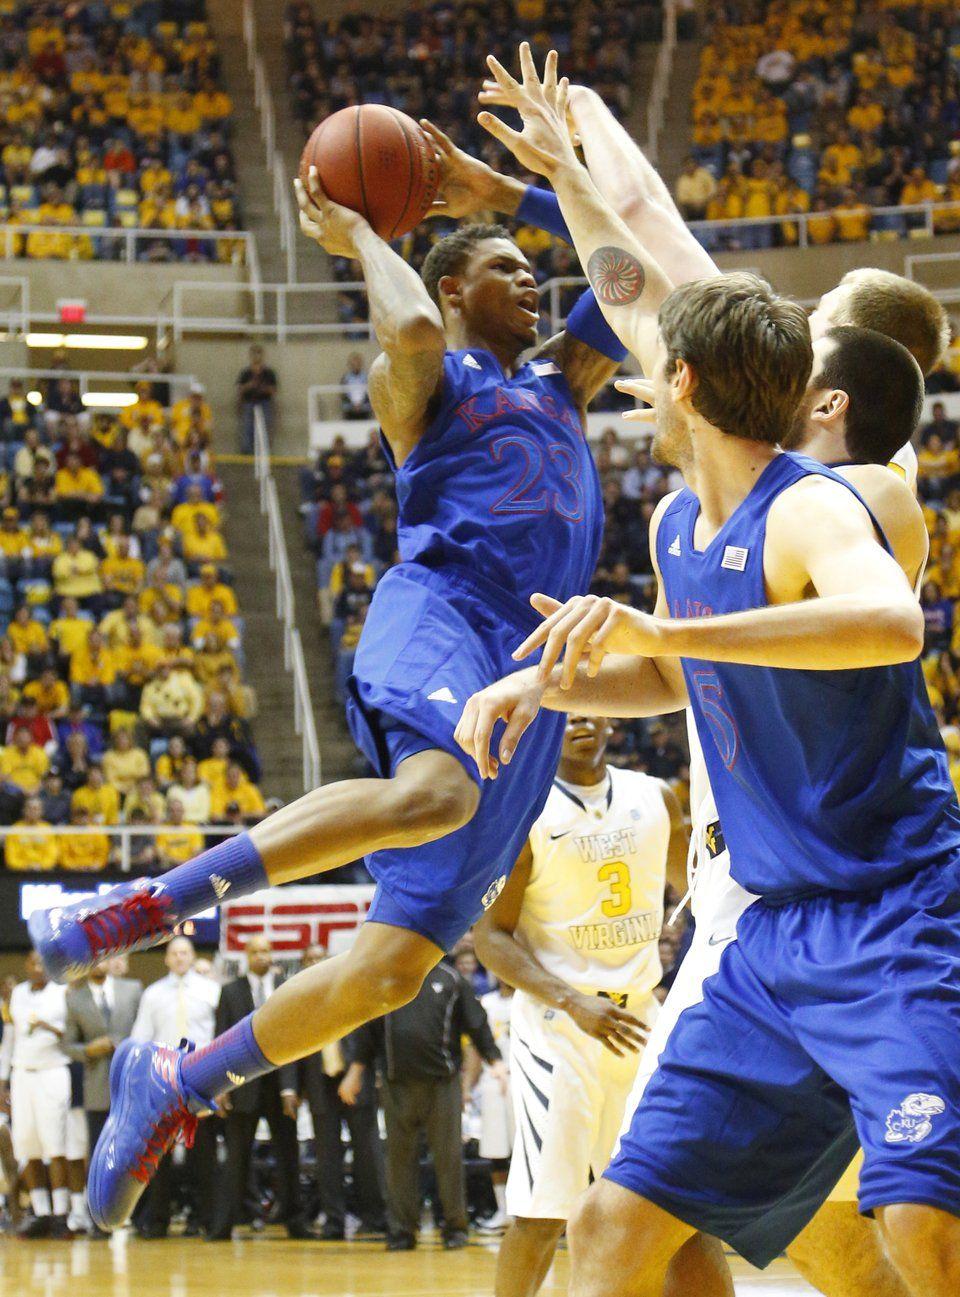 Ben McLemore leaps for basket in the Jayhawks 6156 win